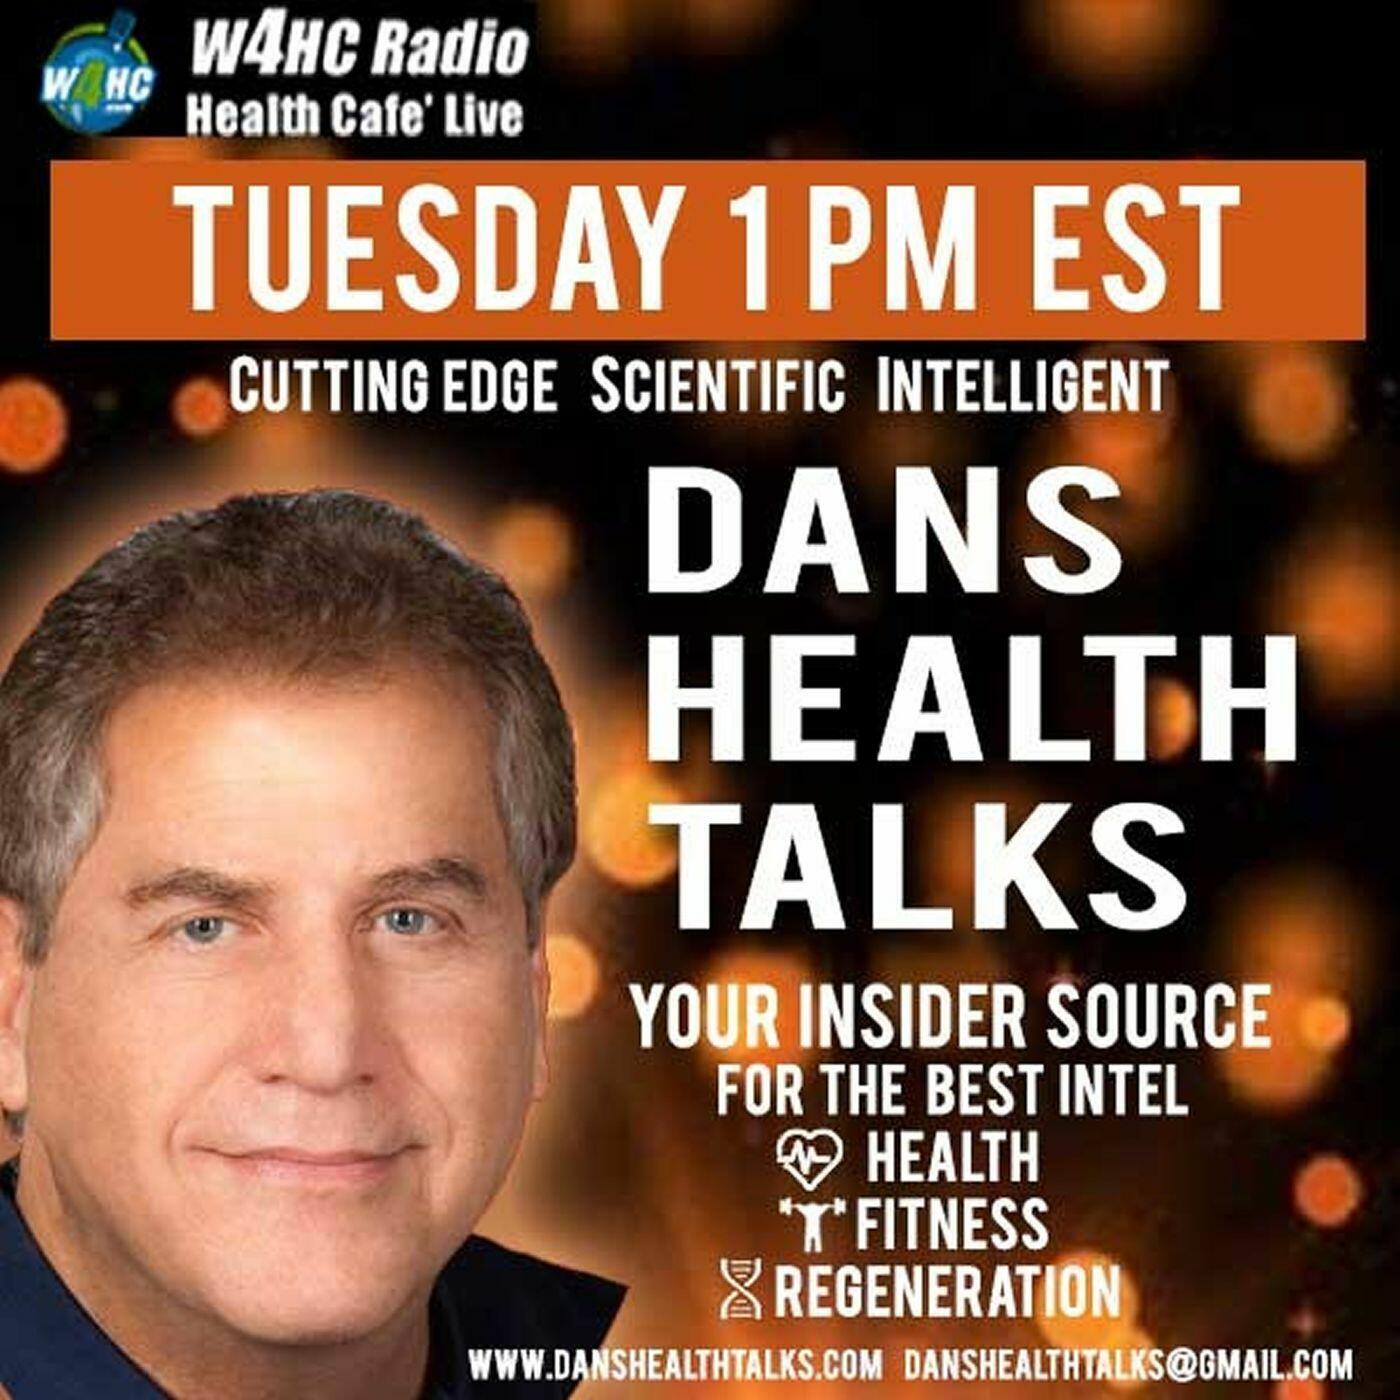 Dan's Health Talks